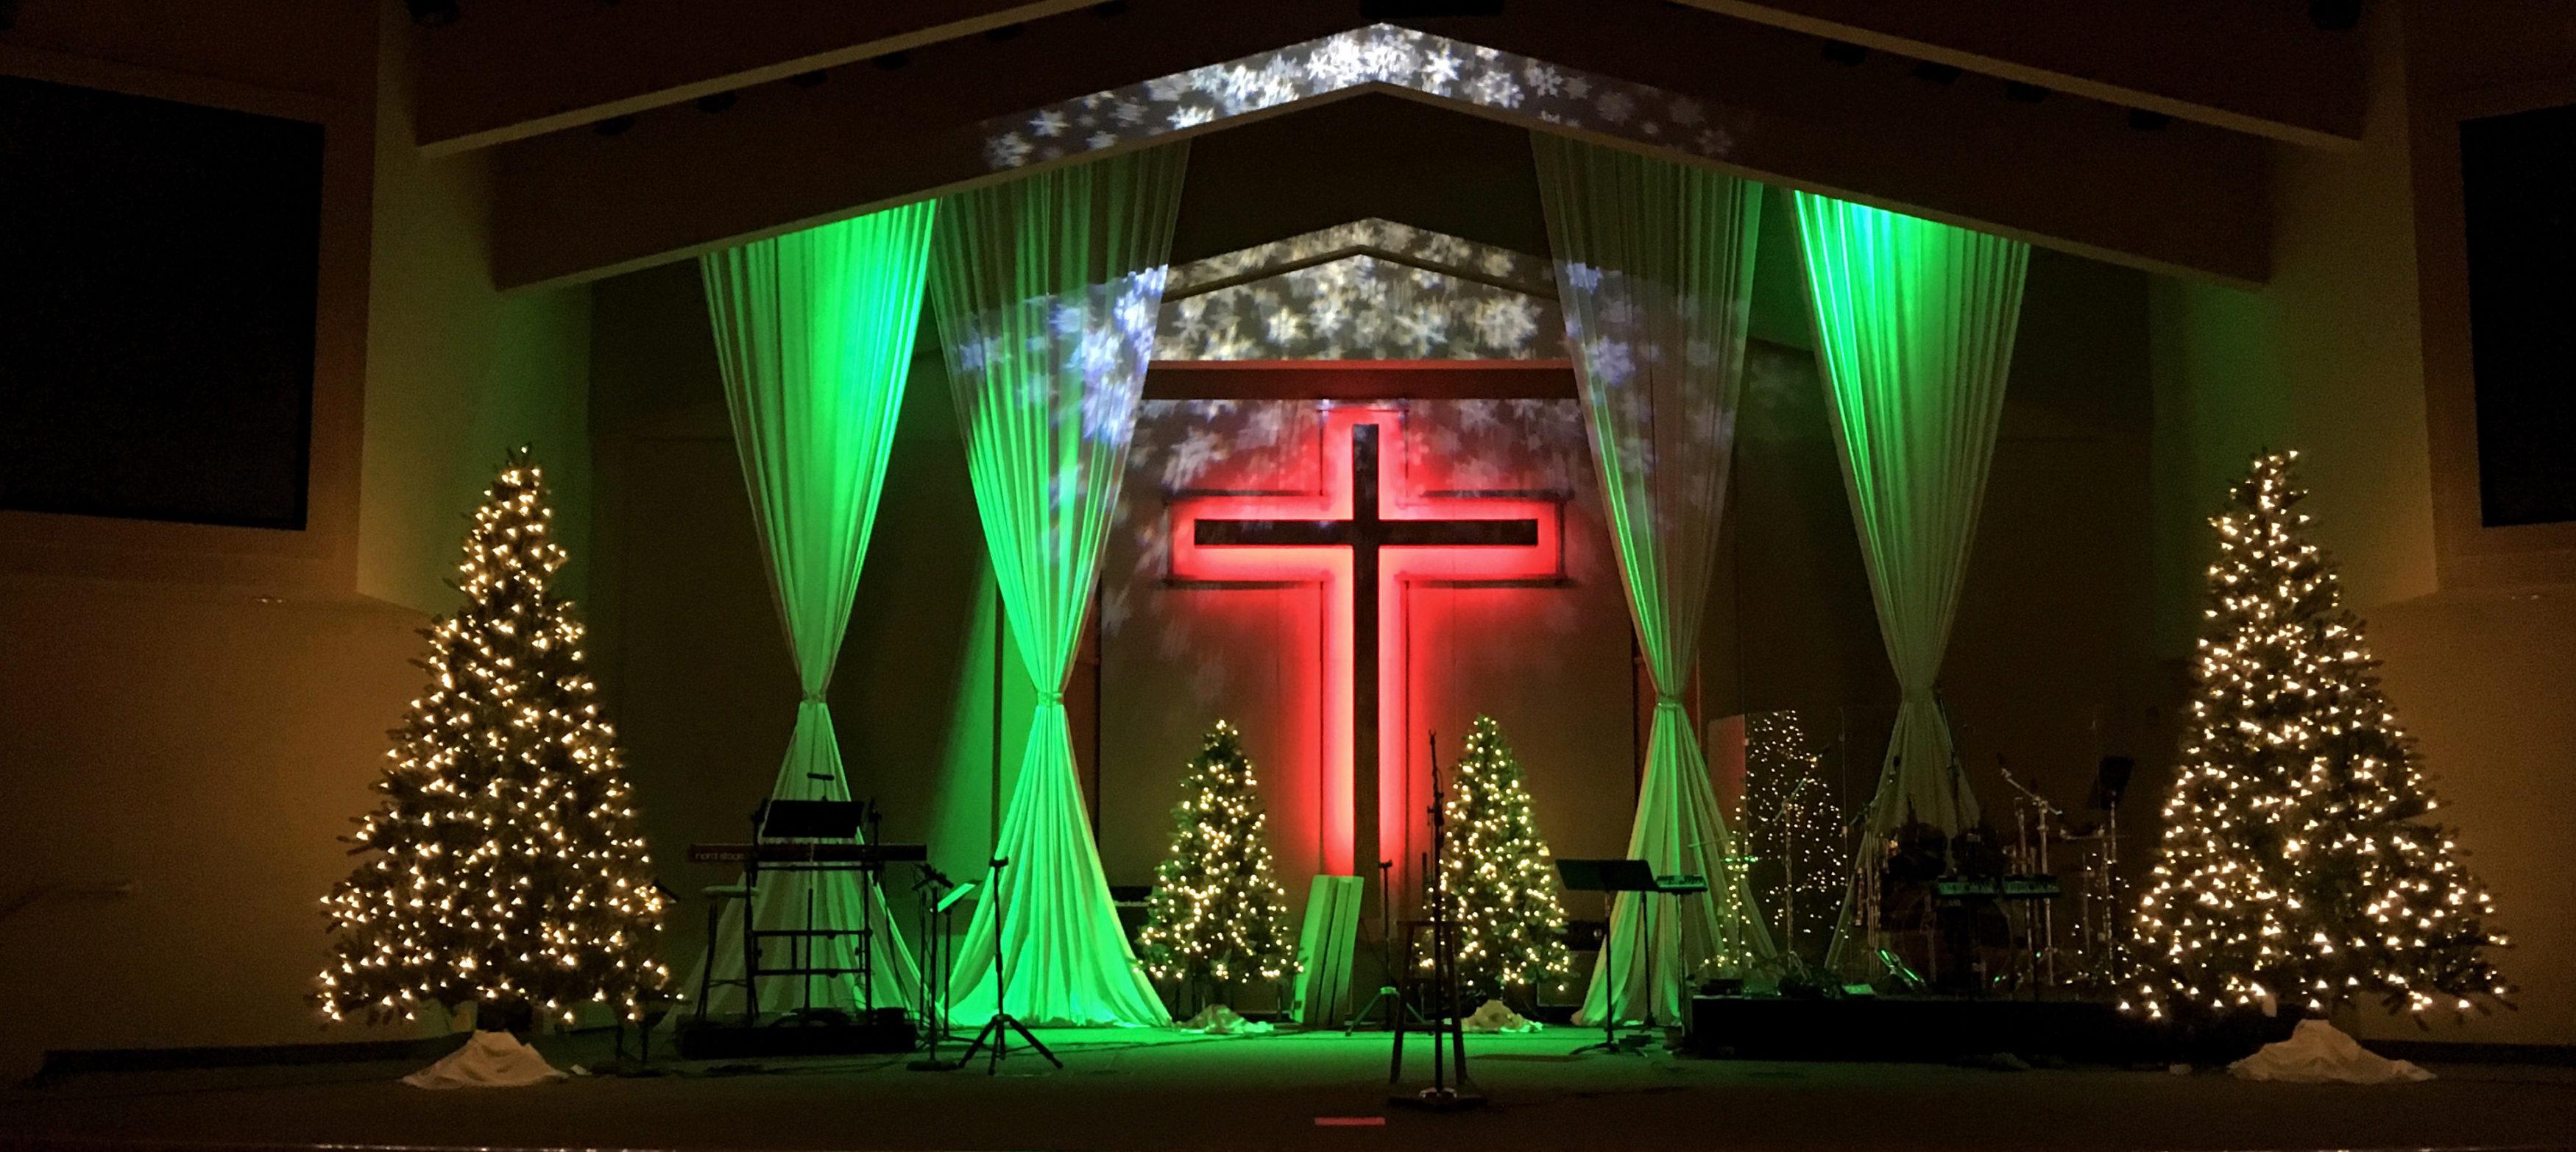 Poinsettia Christmas Light Set